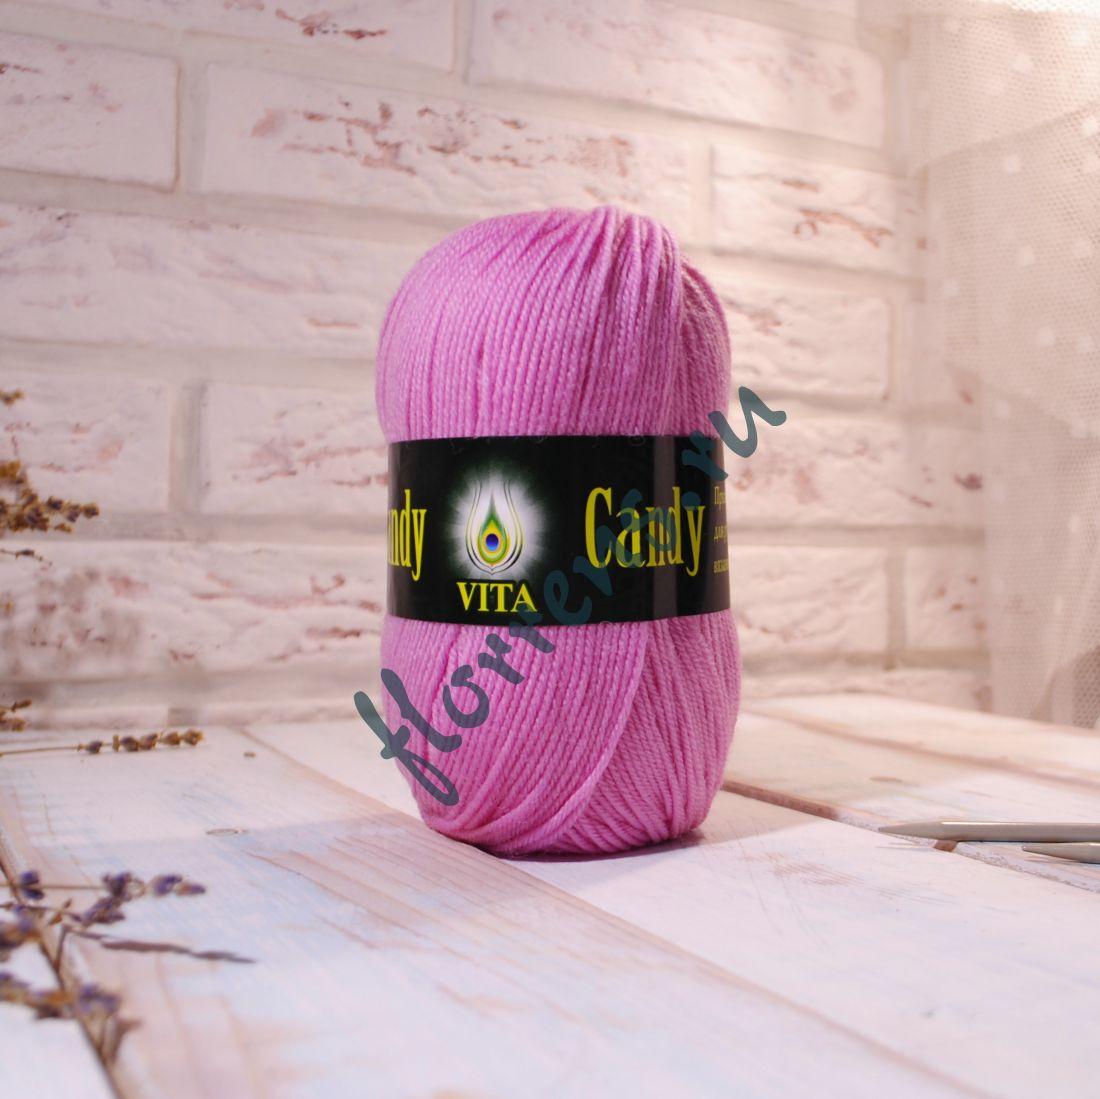 "Пряжа ""Vita"" Candy / 2516 нежно-розовый"